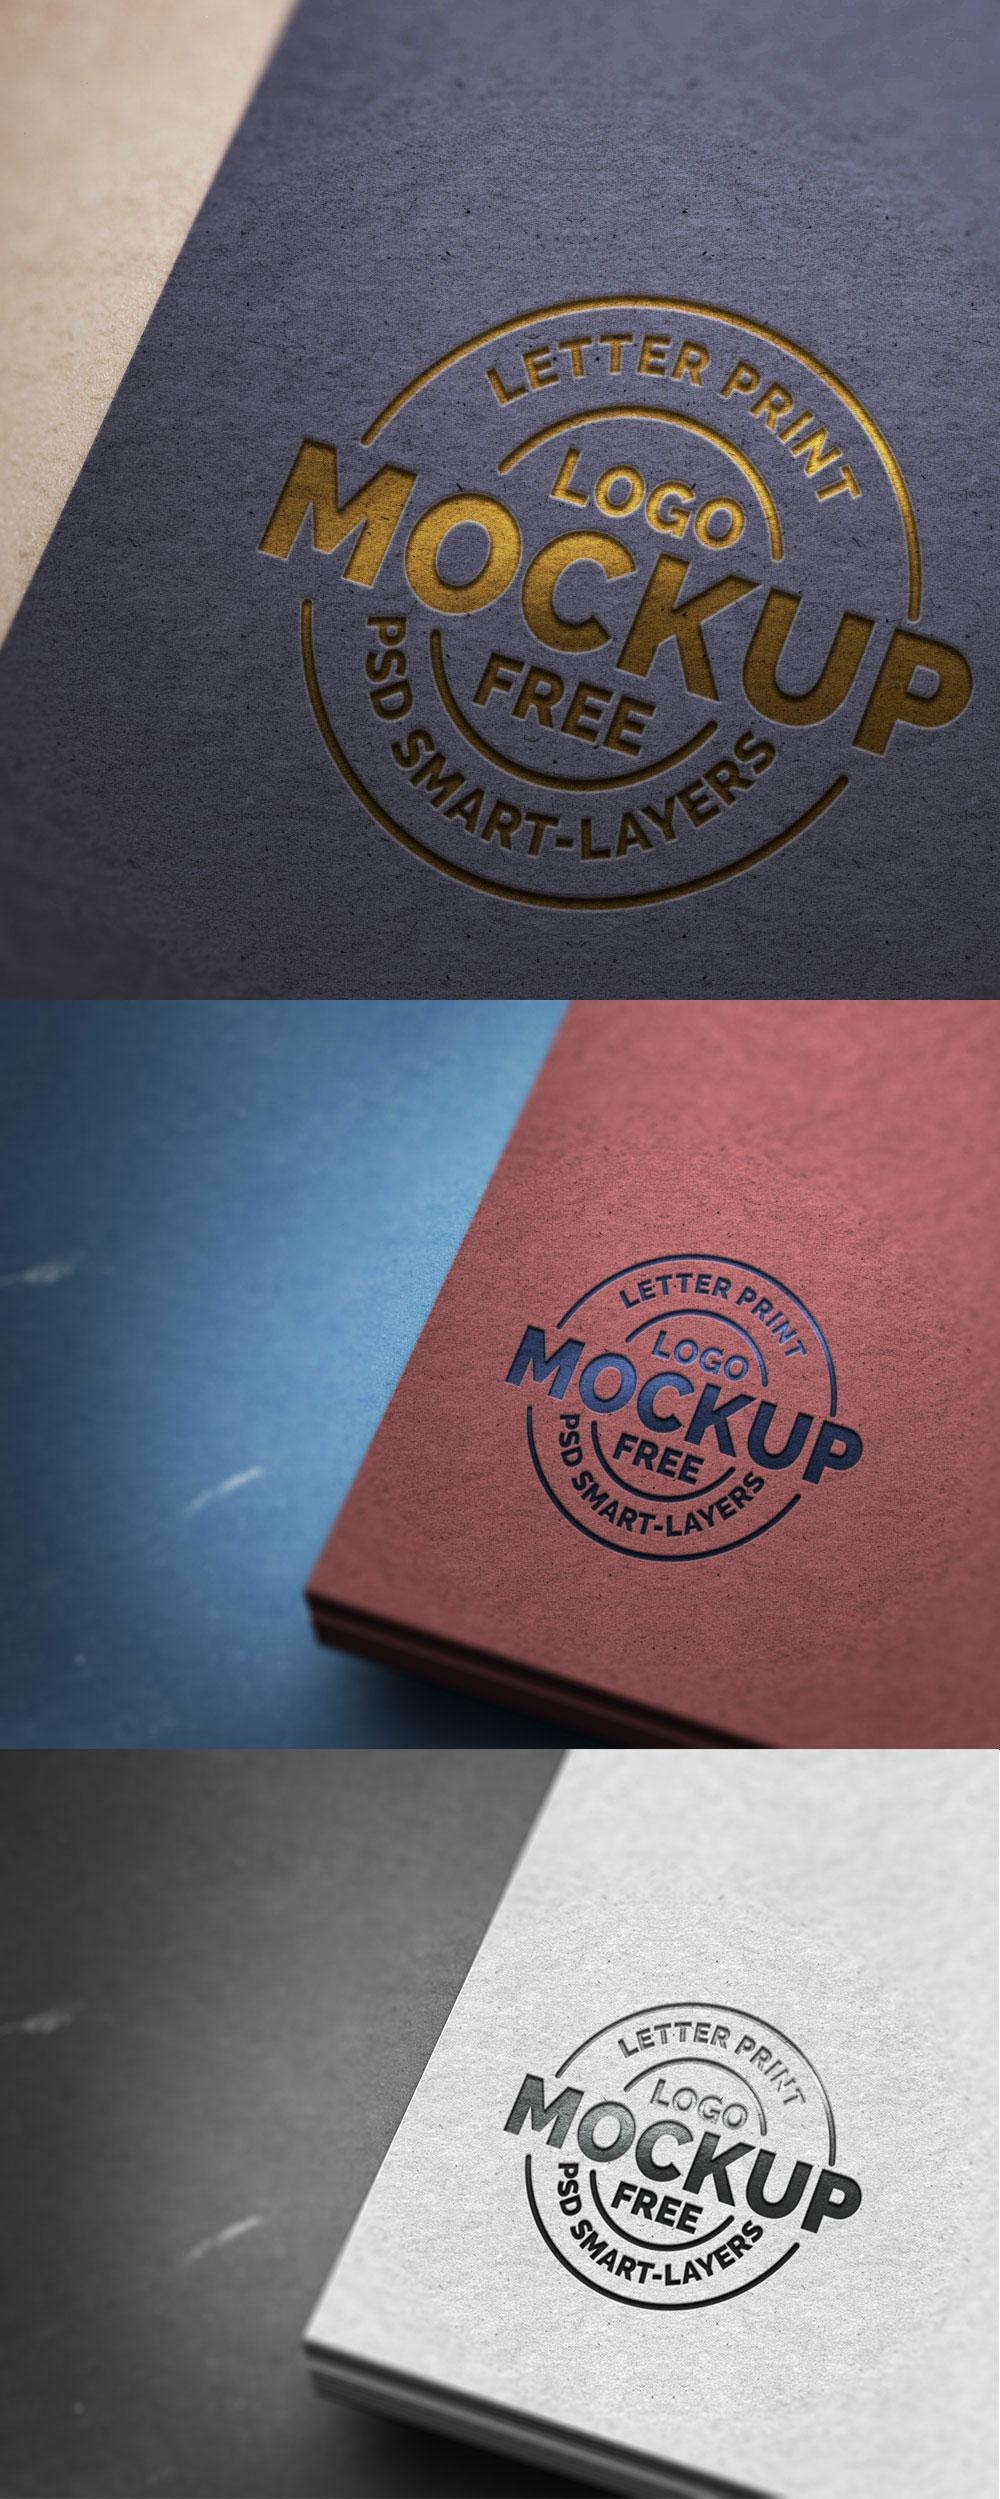 35 Best Free Logos Mock Ups 2015 Free Psd Templates